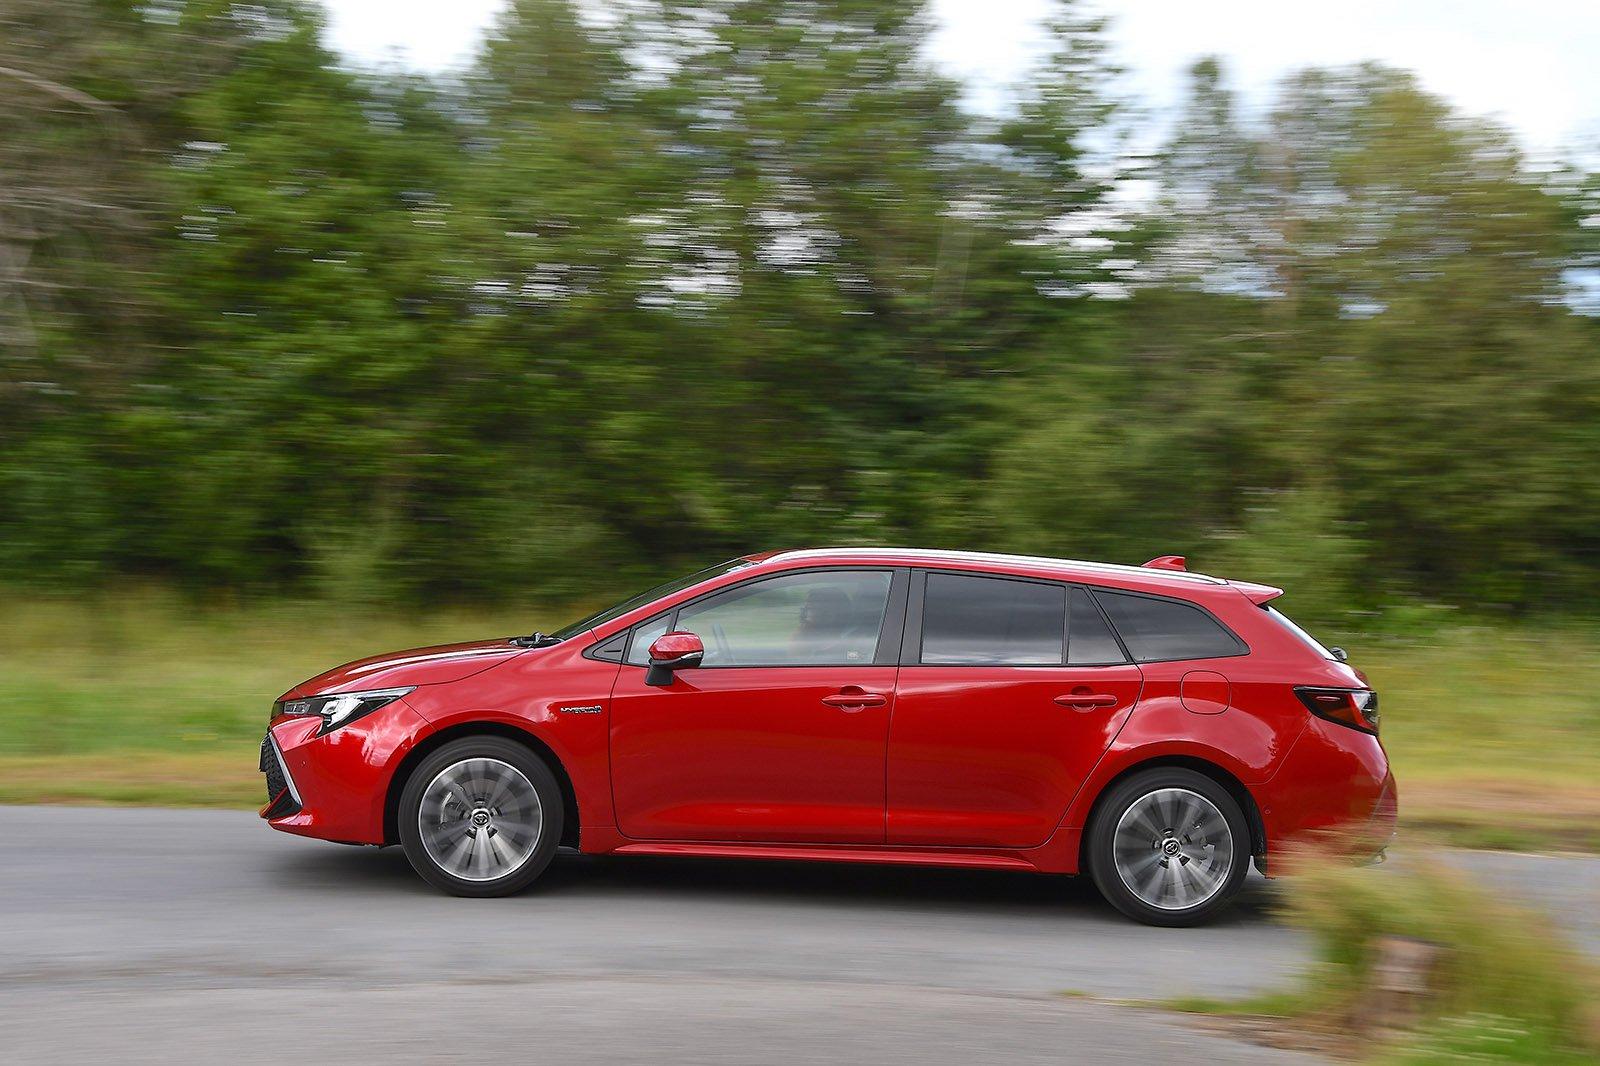 Toyota Corolla Touring Sport 2020 RHD left panning